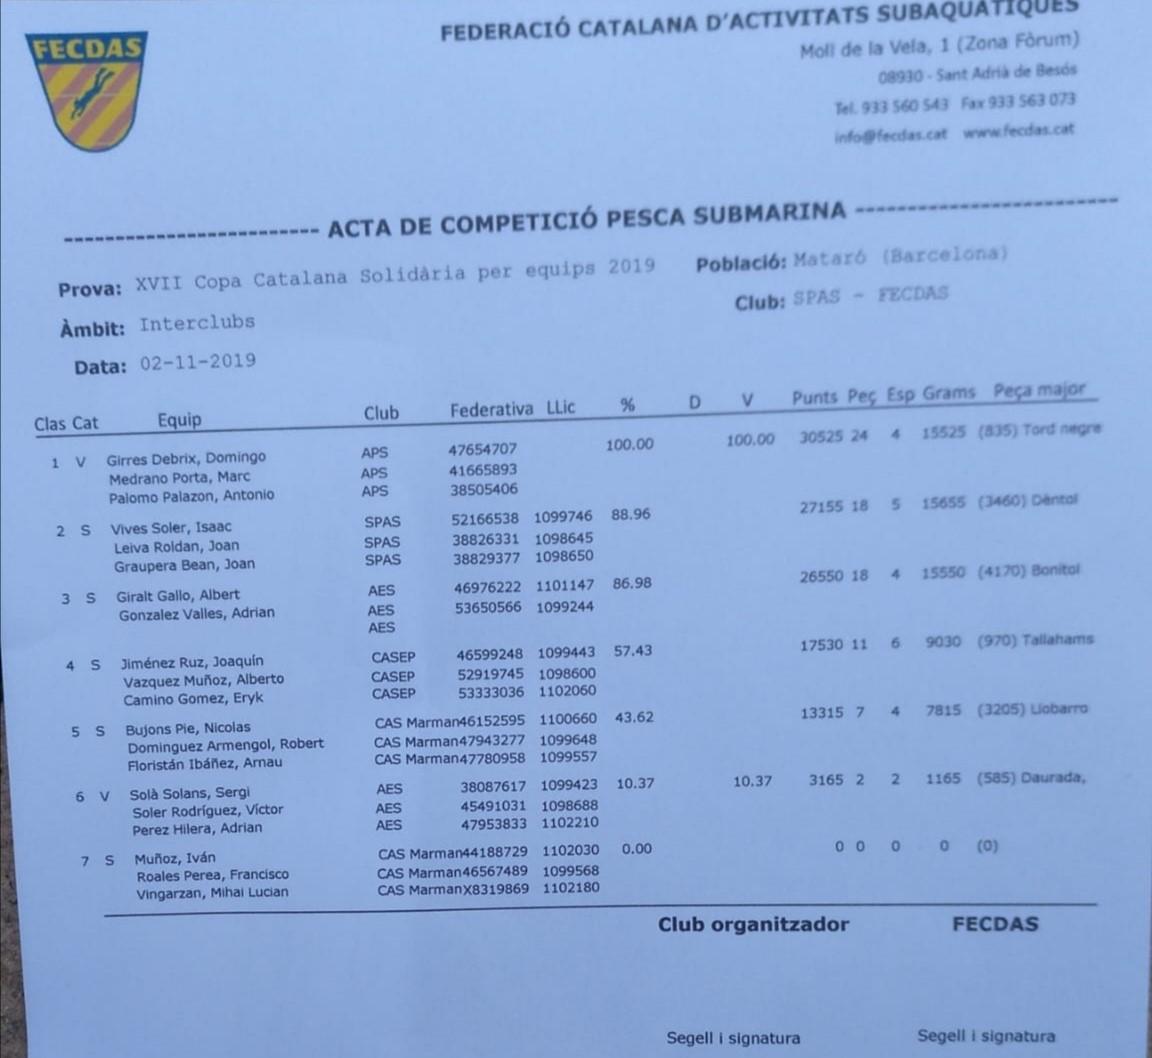 copacatalana14